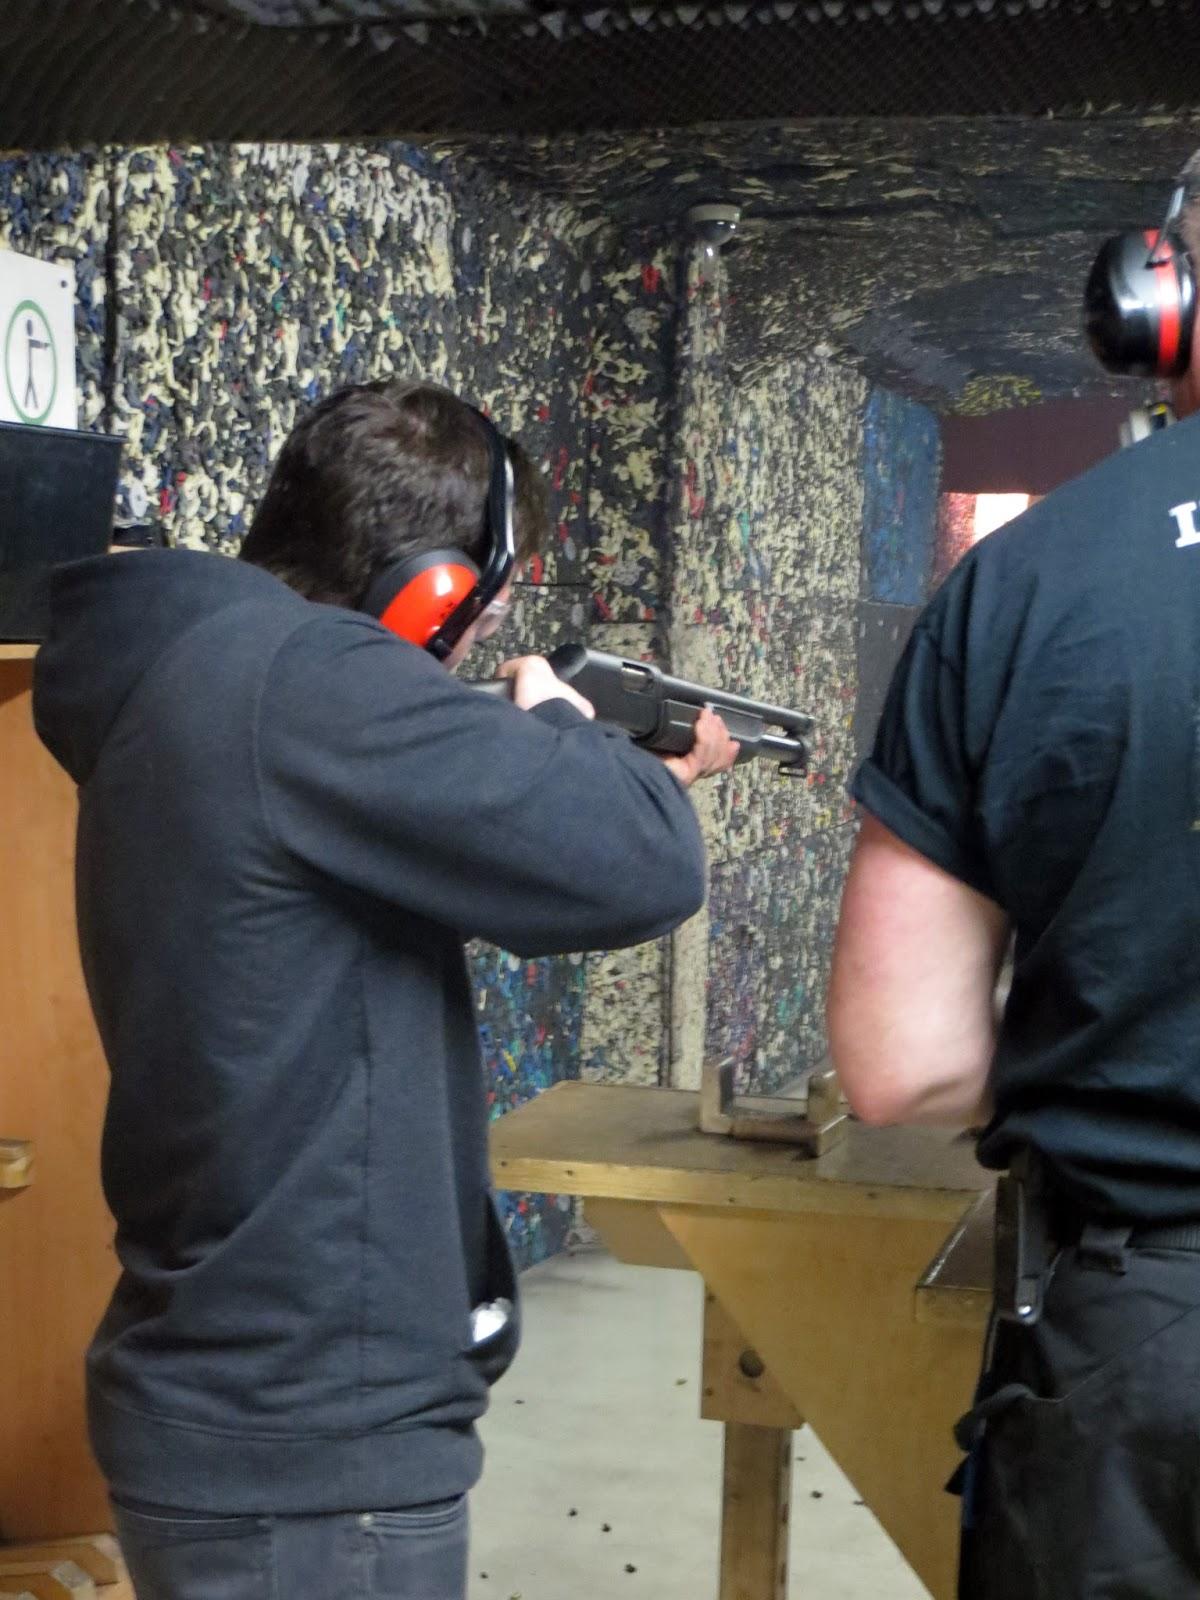 shotgun, Celeritas shooting club, pistol, rifle, revolver, shooting, range, guns, firing, ak47, desert eagle, budapest, hungary, travel,